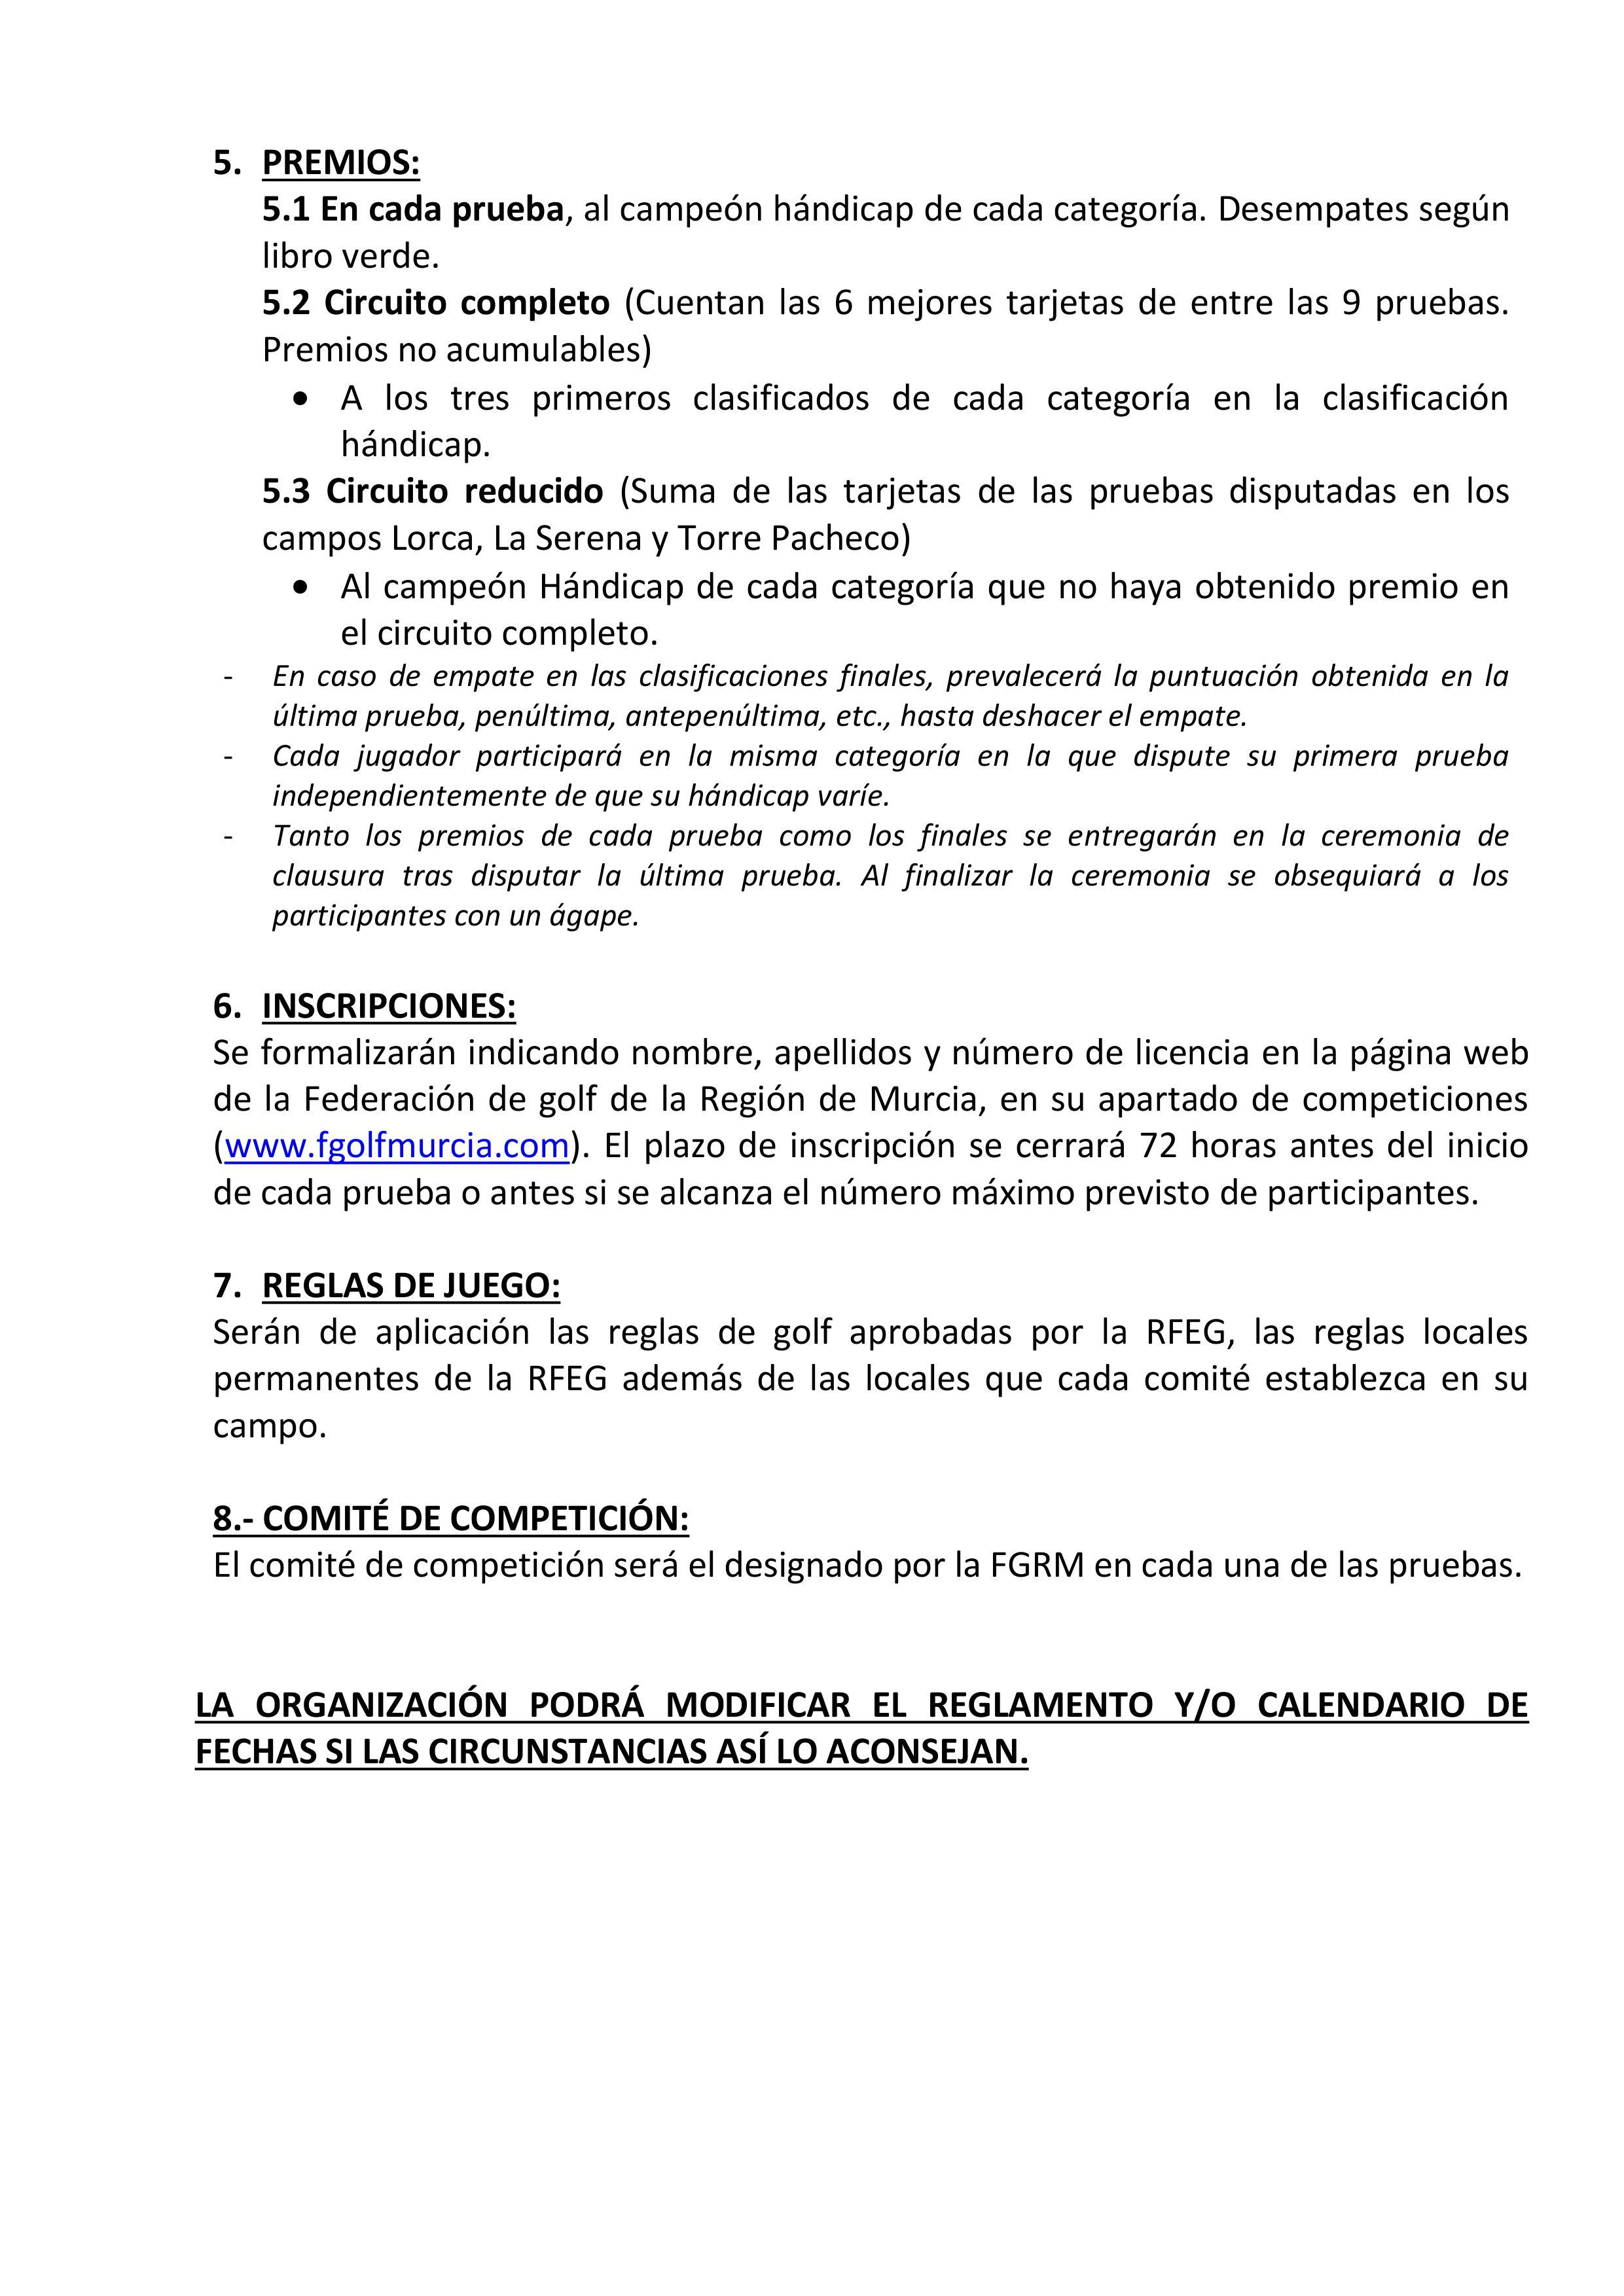 191116 TPA, Reglamento (2)